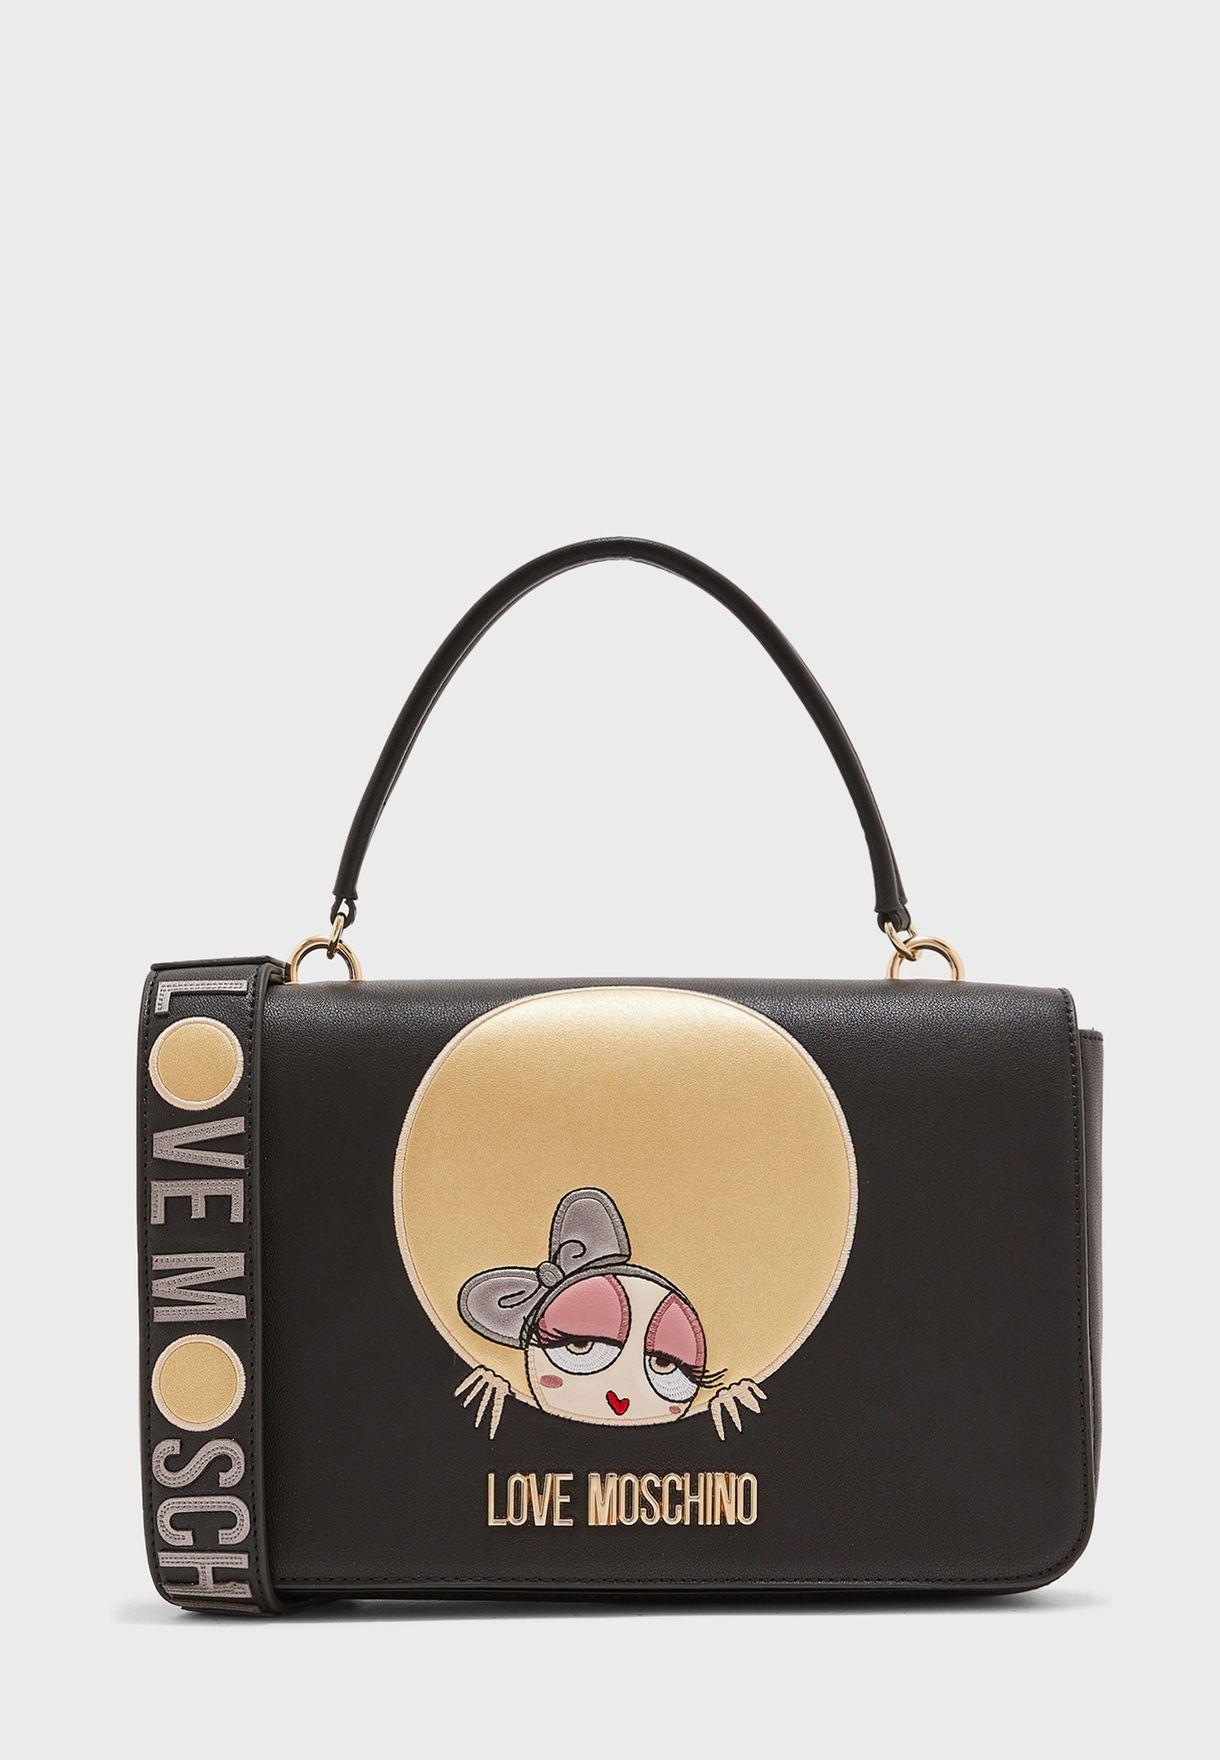 Love Moschino Womens Top Handle Cross Body Bags Handbag Black